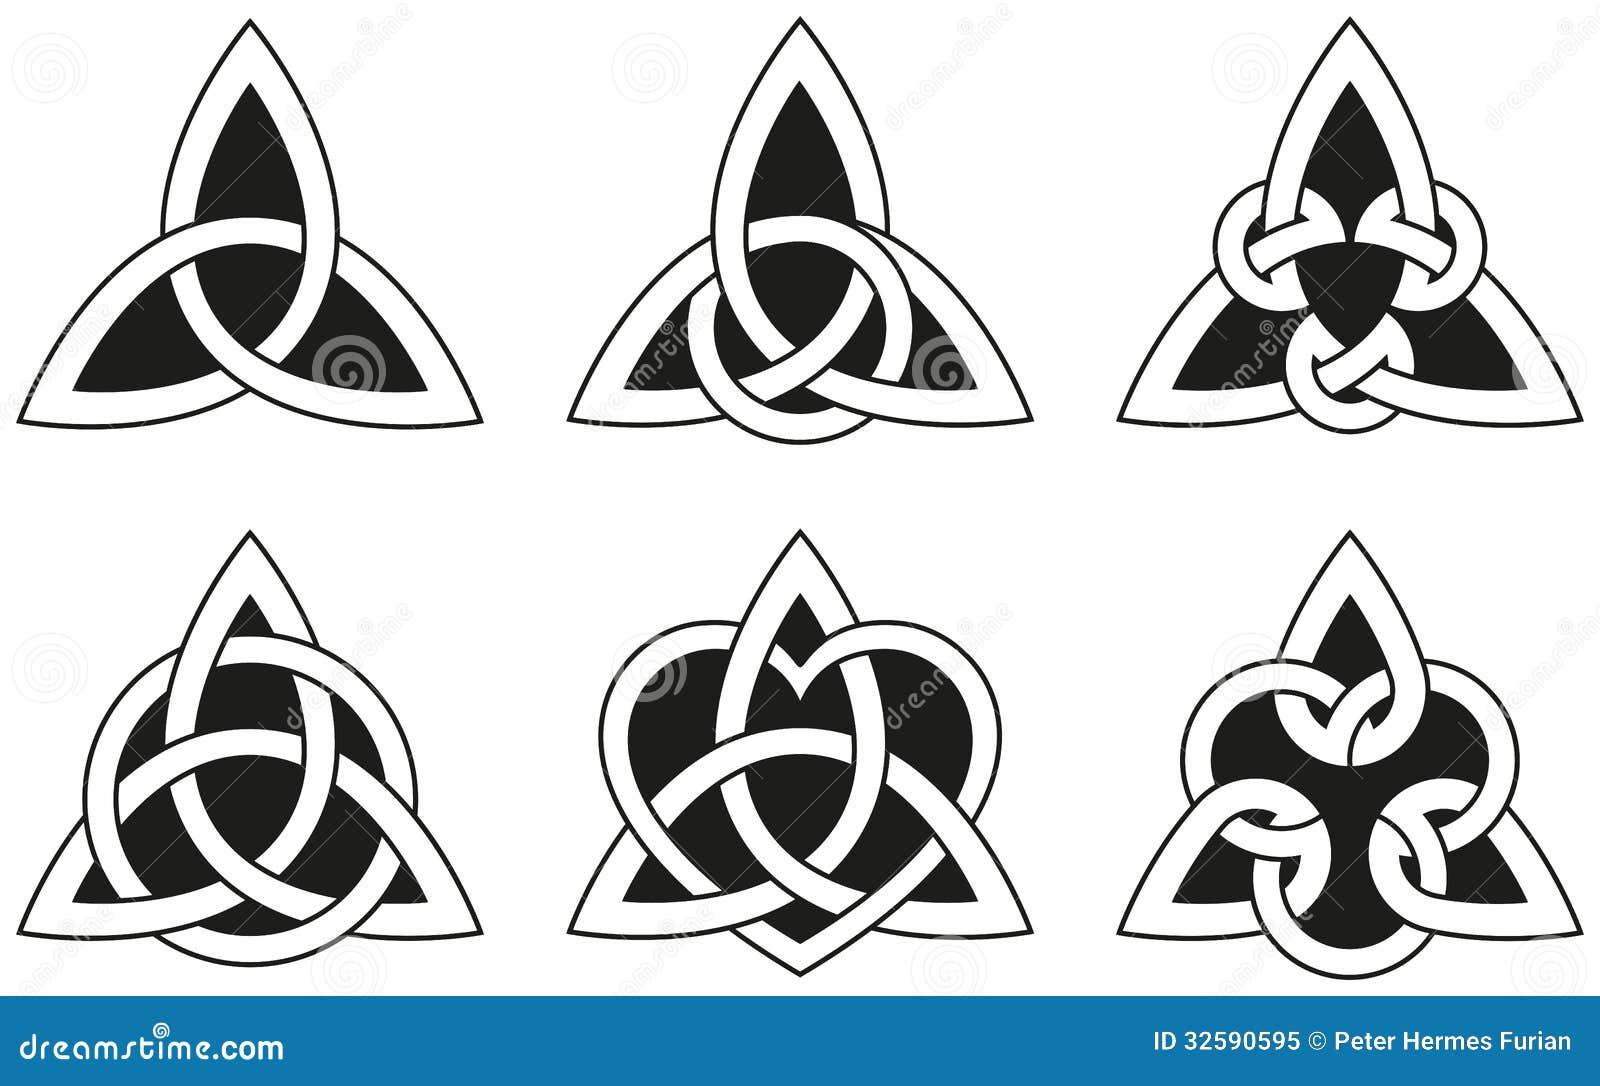 Celtic Triangle Knots Royalty Free Stock Photo Image 32590595